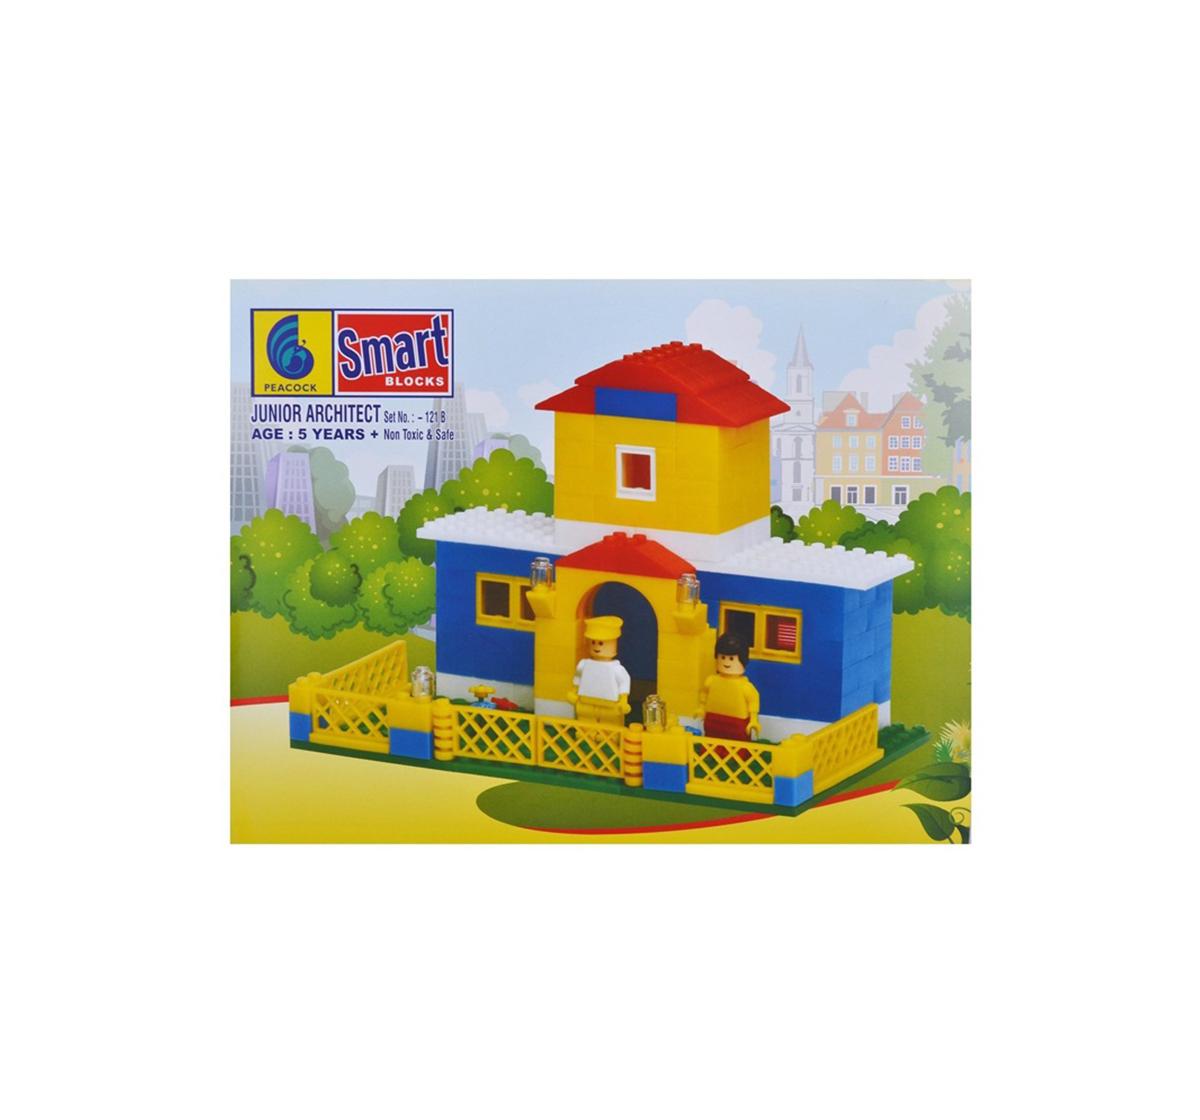 Peacock | Peacock Junior Architect Generic Blocks for Kids age 5Y+